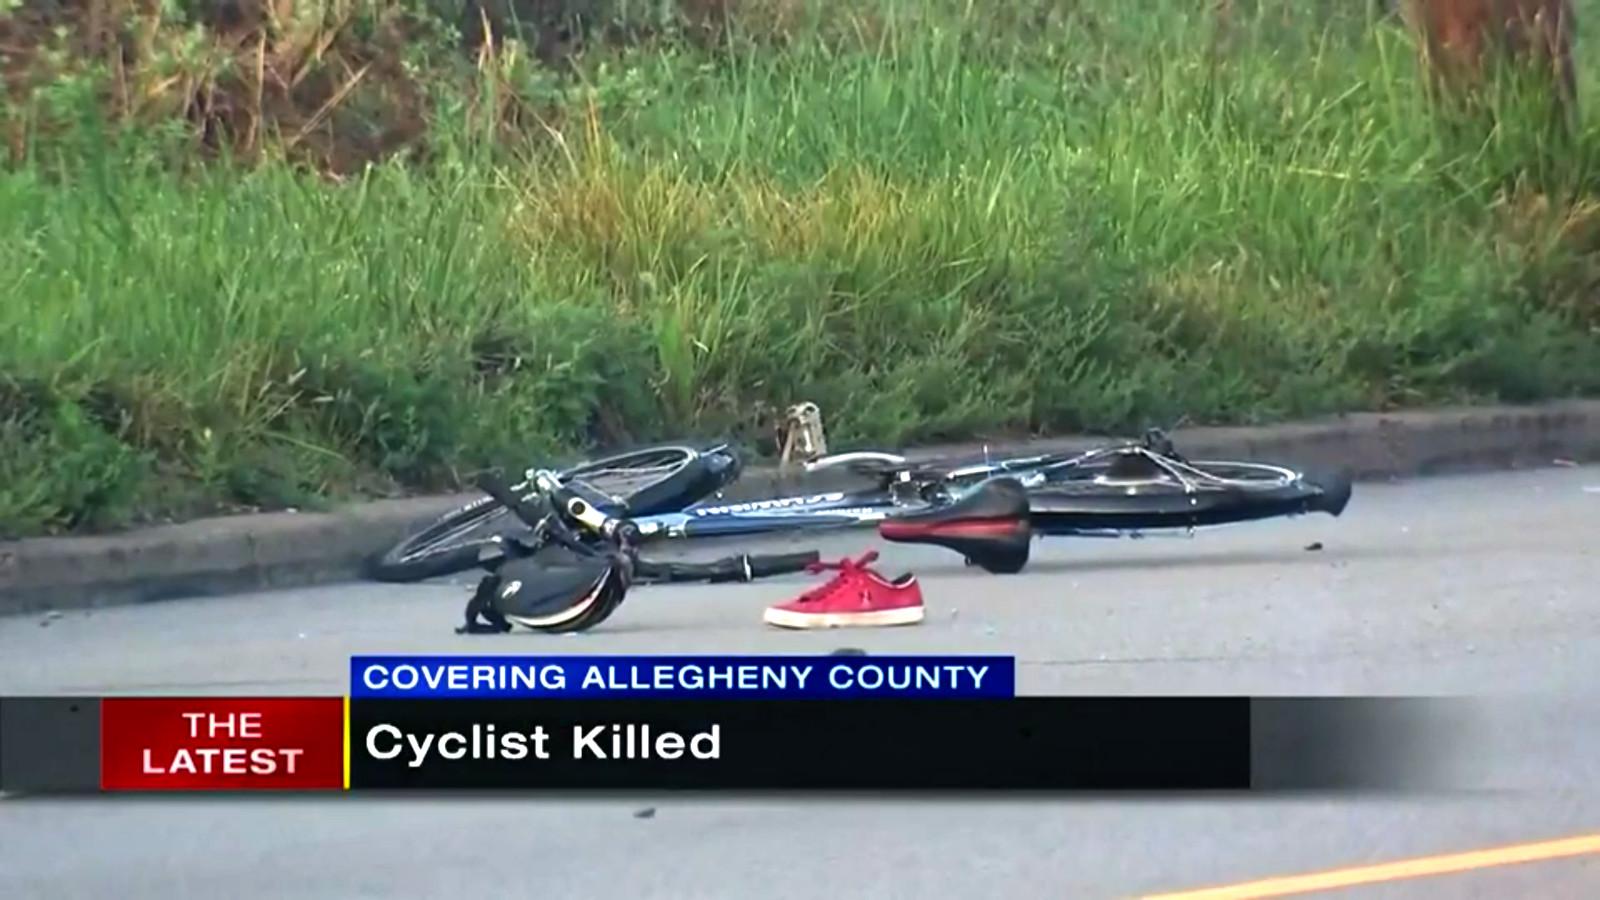 The Latest Cyclist Killed